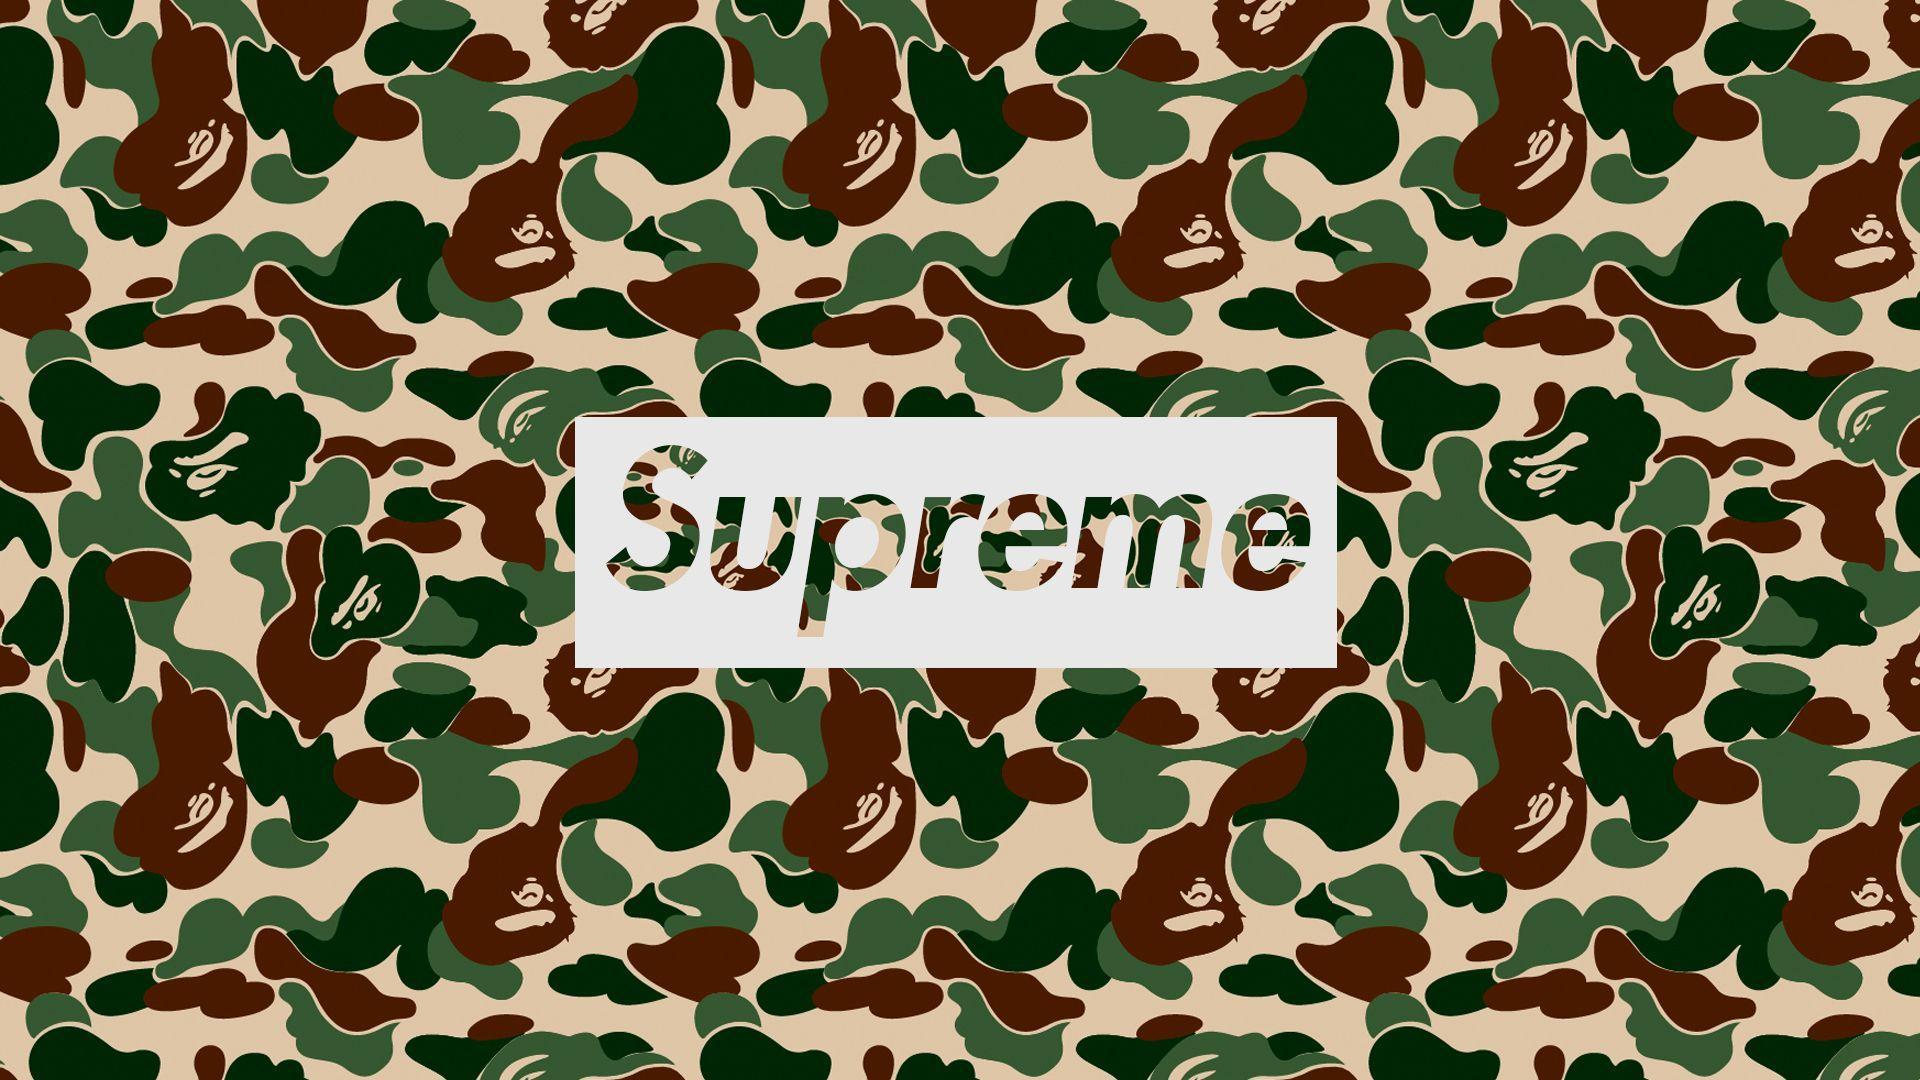 Supreme x bape design album on imgur